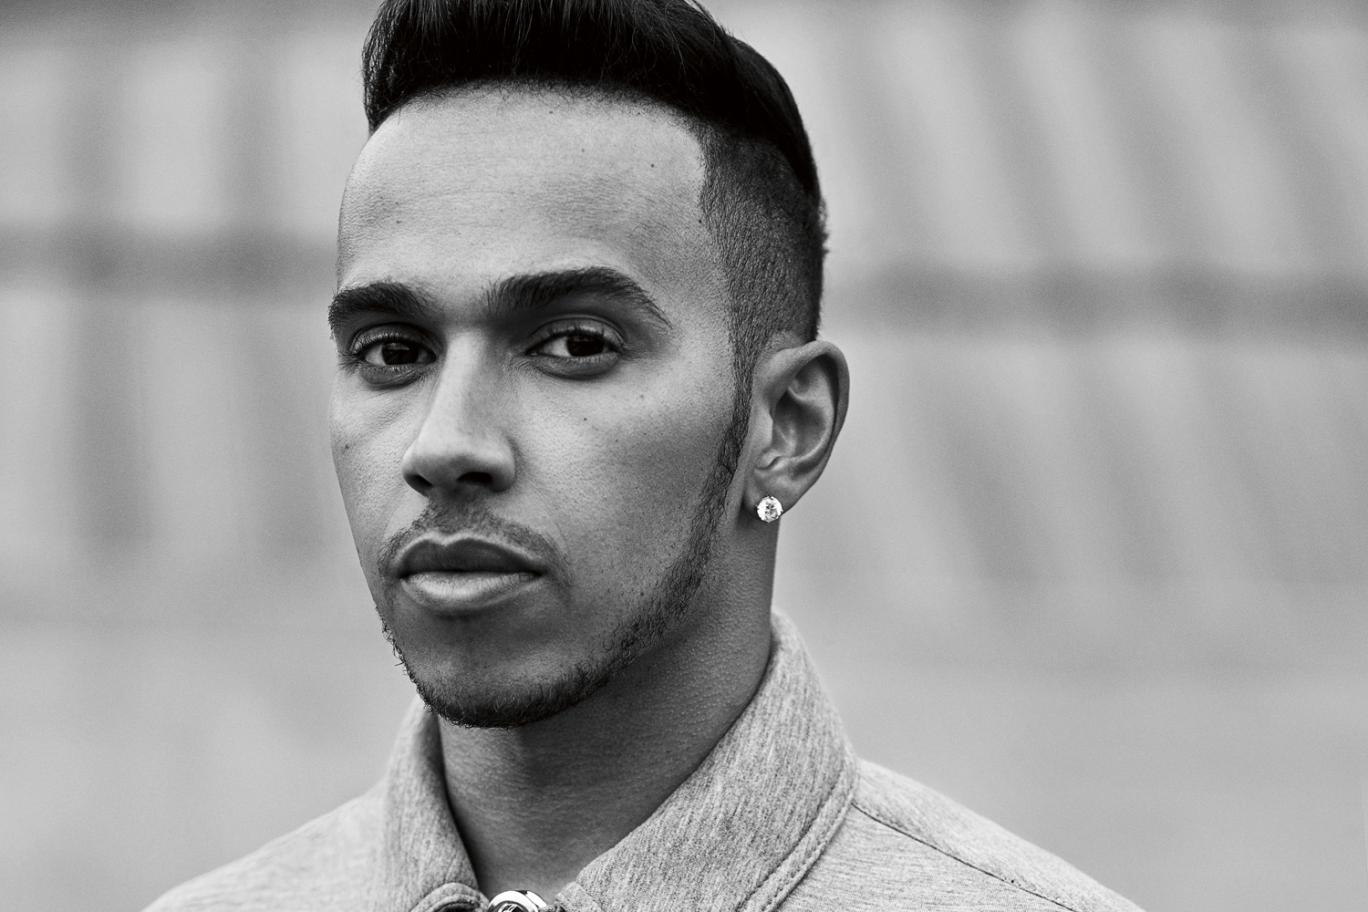 Racing driver Lewis Hamilton - age: 32